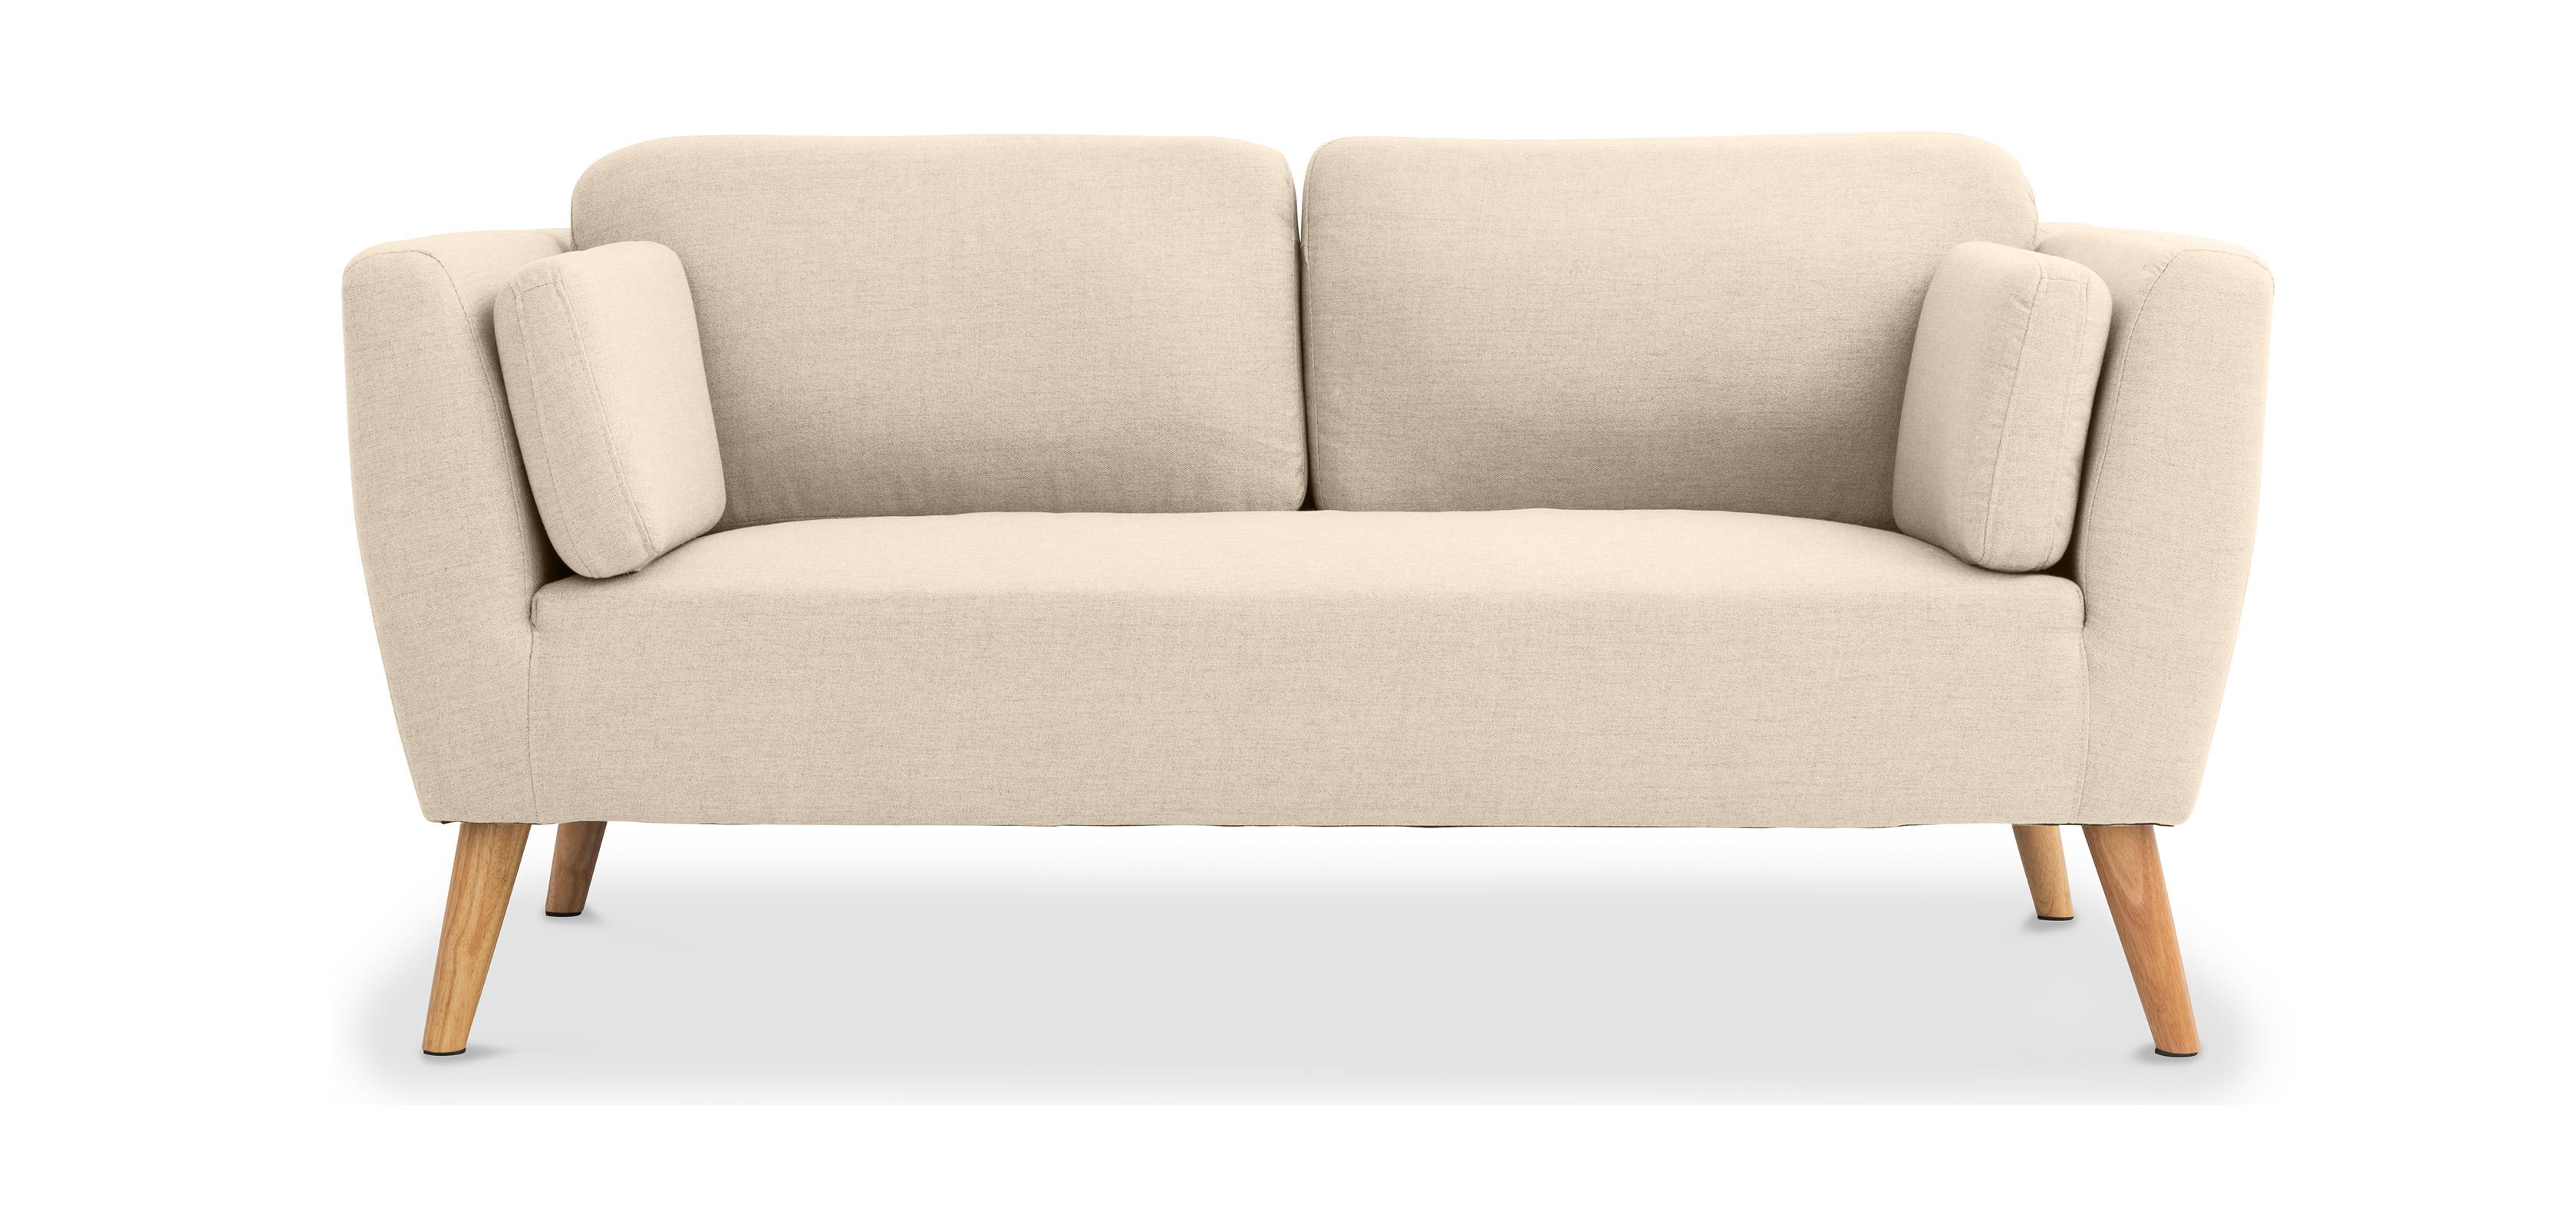 canap 2 places scandinave. Black Bedroom Furniture Sets. Home Design Ideas